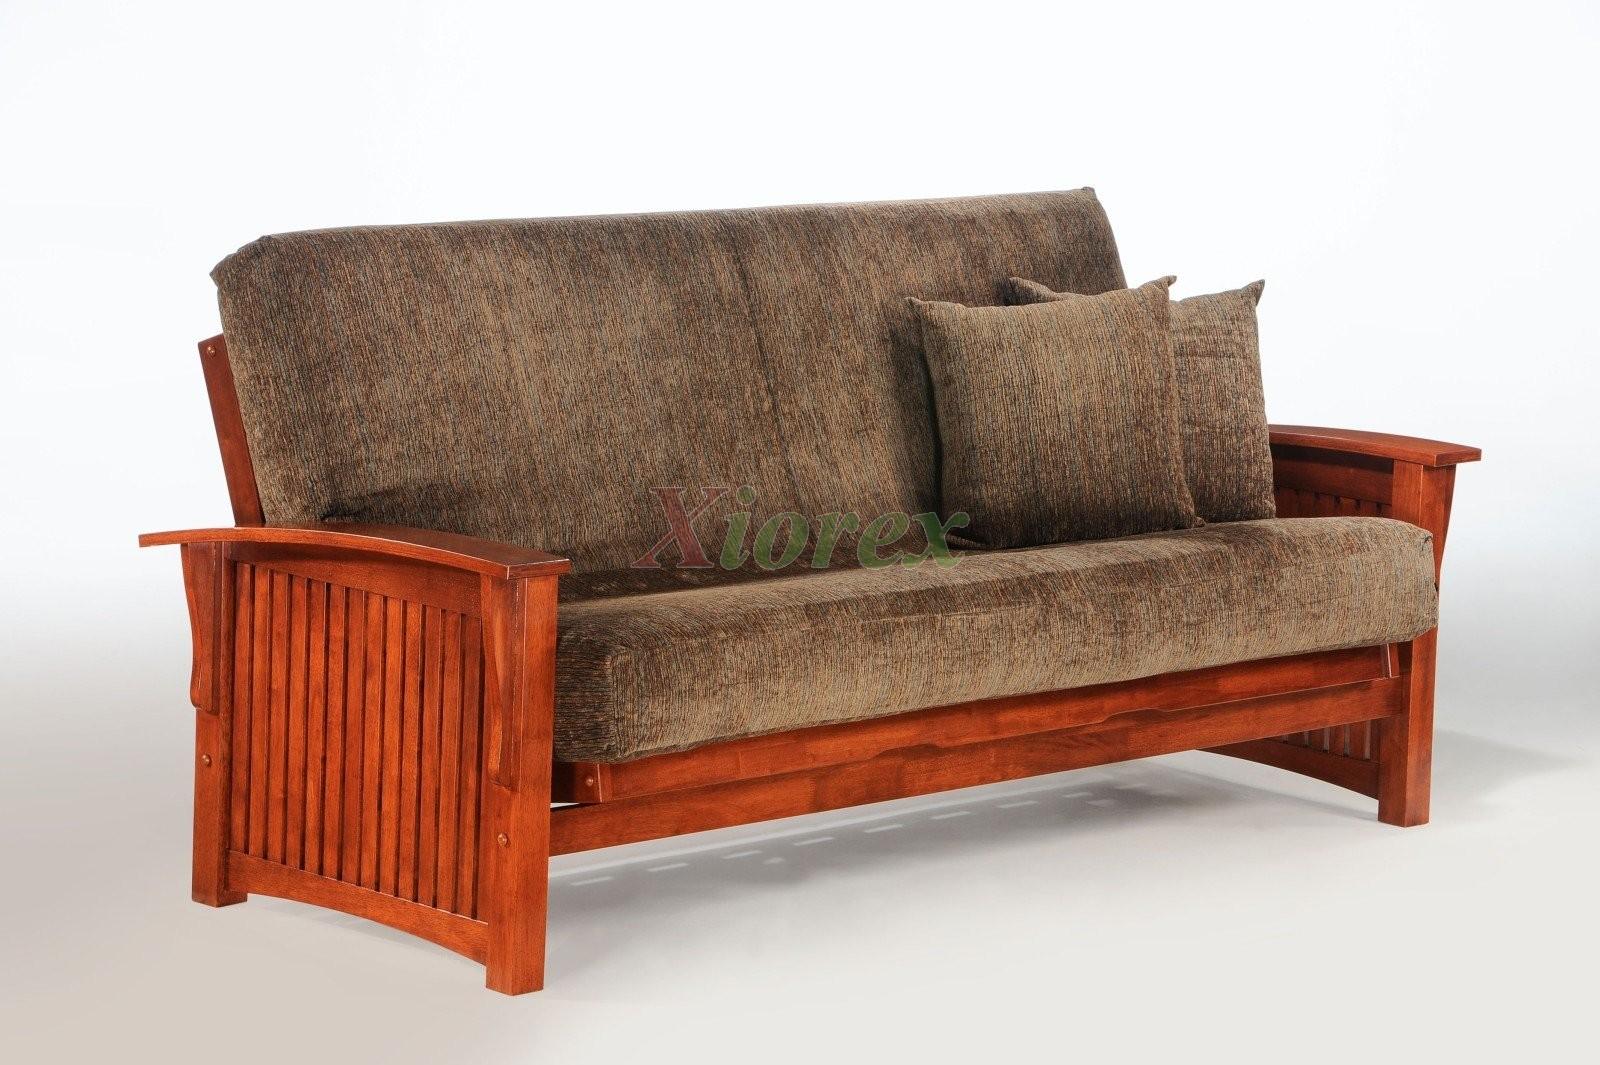 wooden futon chairs ergonomic office chair johannesburg wood frame night and day winter xiorex